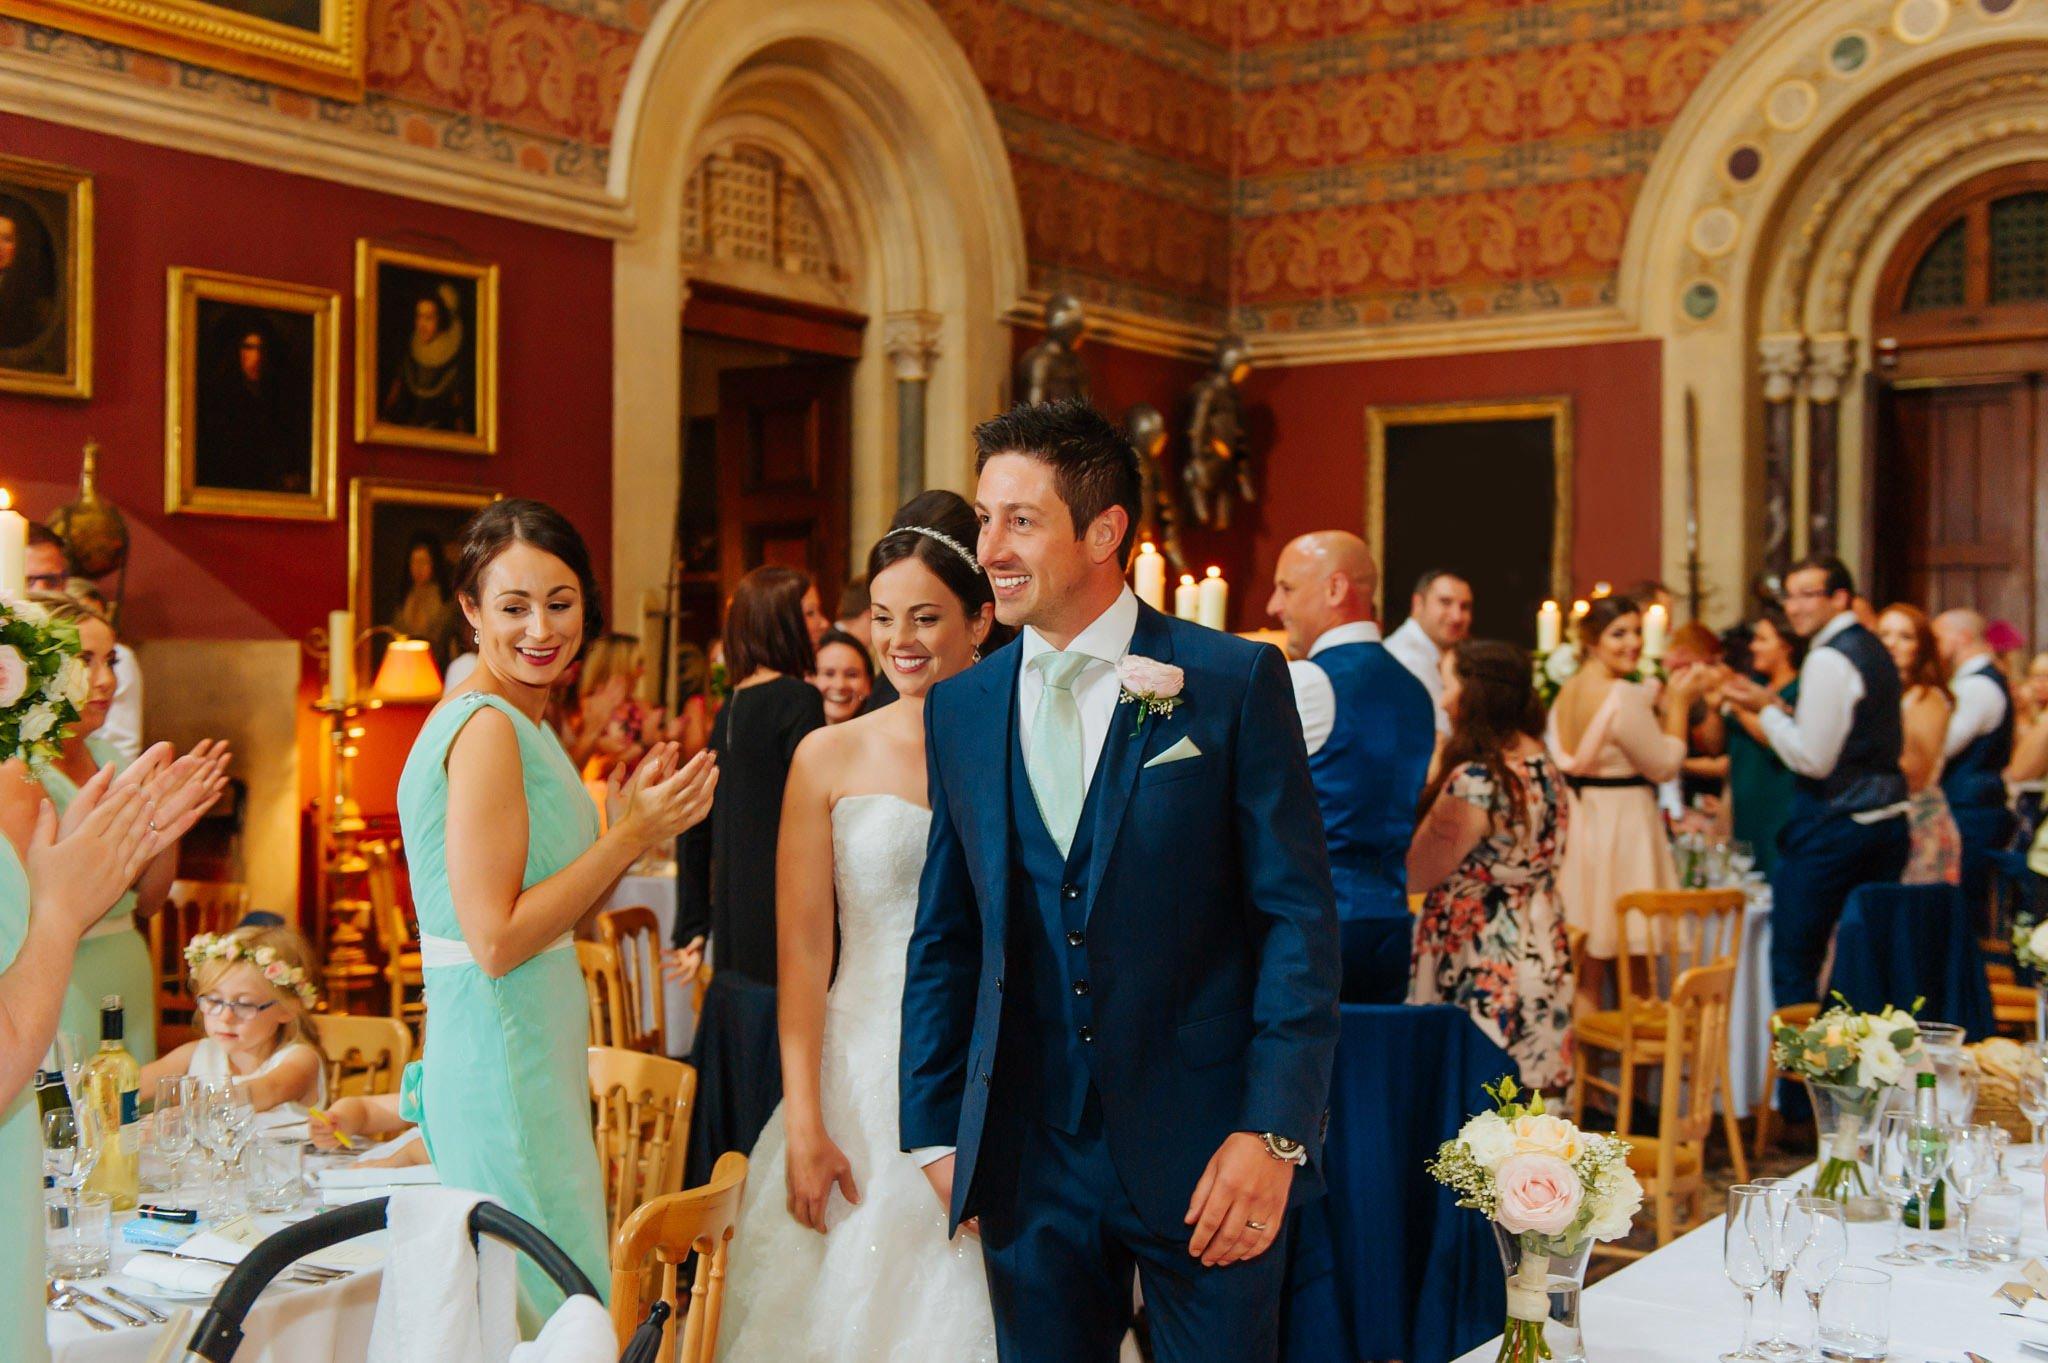 Eastnor Castle wedding photographer Herefordshire, West Midlands - Sarah + Dean 49